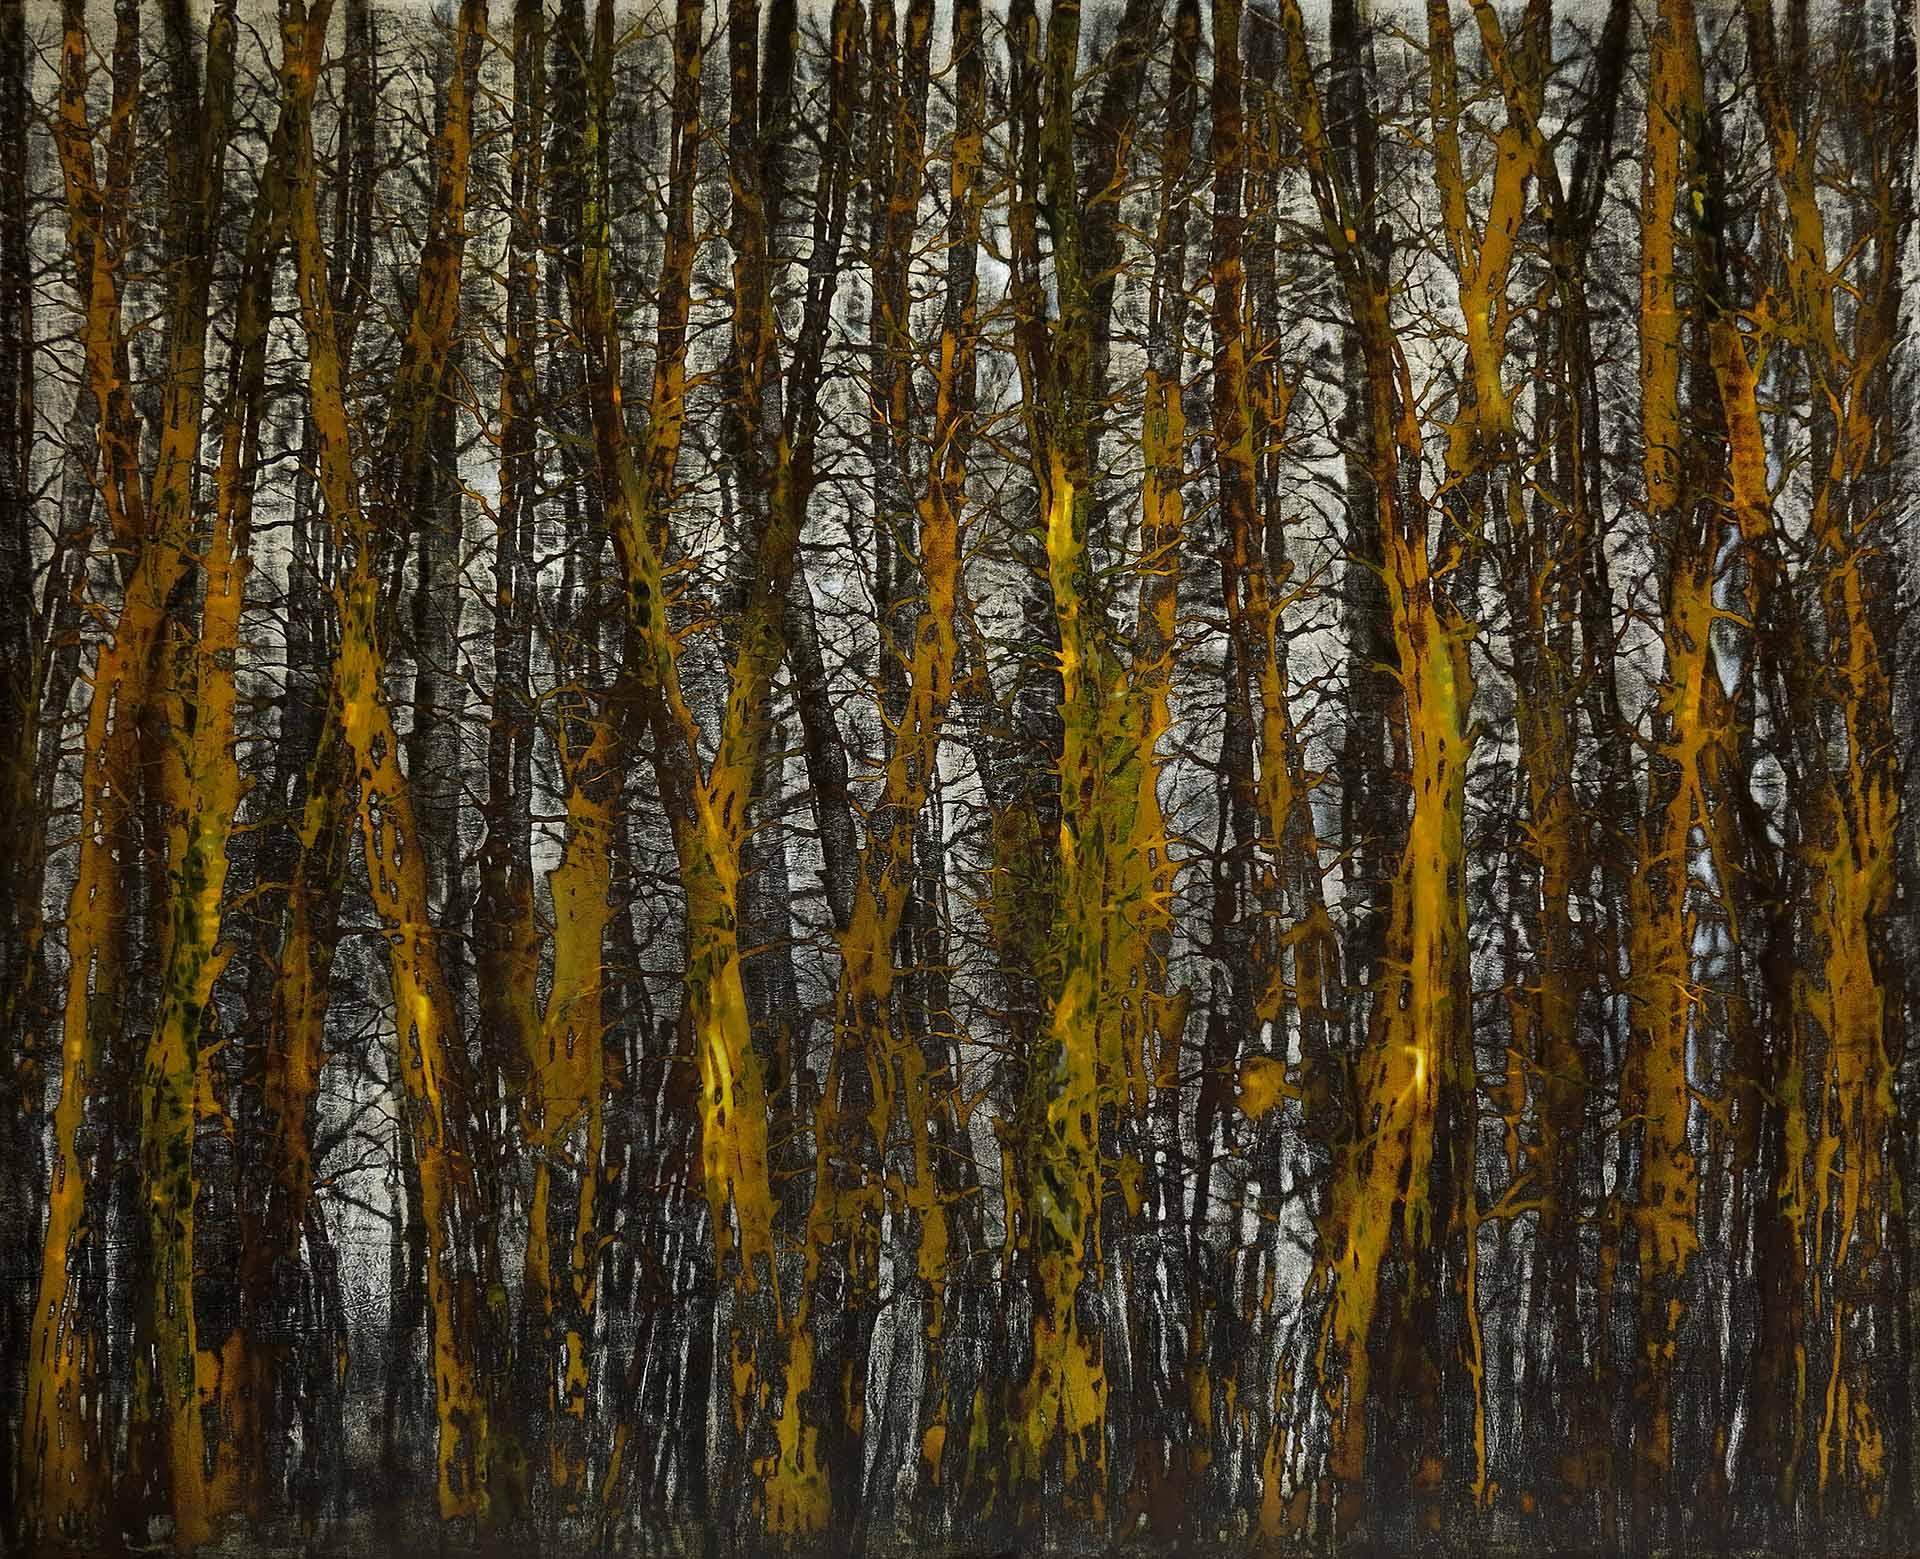 Tuval üzeri akrilik – Acrylic on canvas 170*140 cm